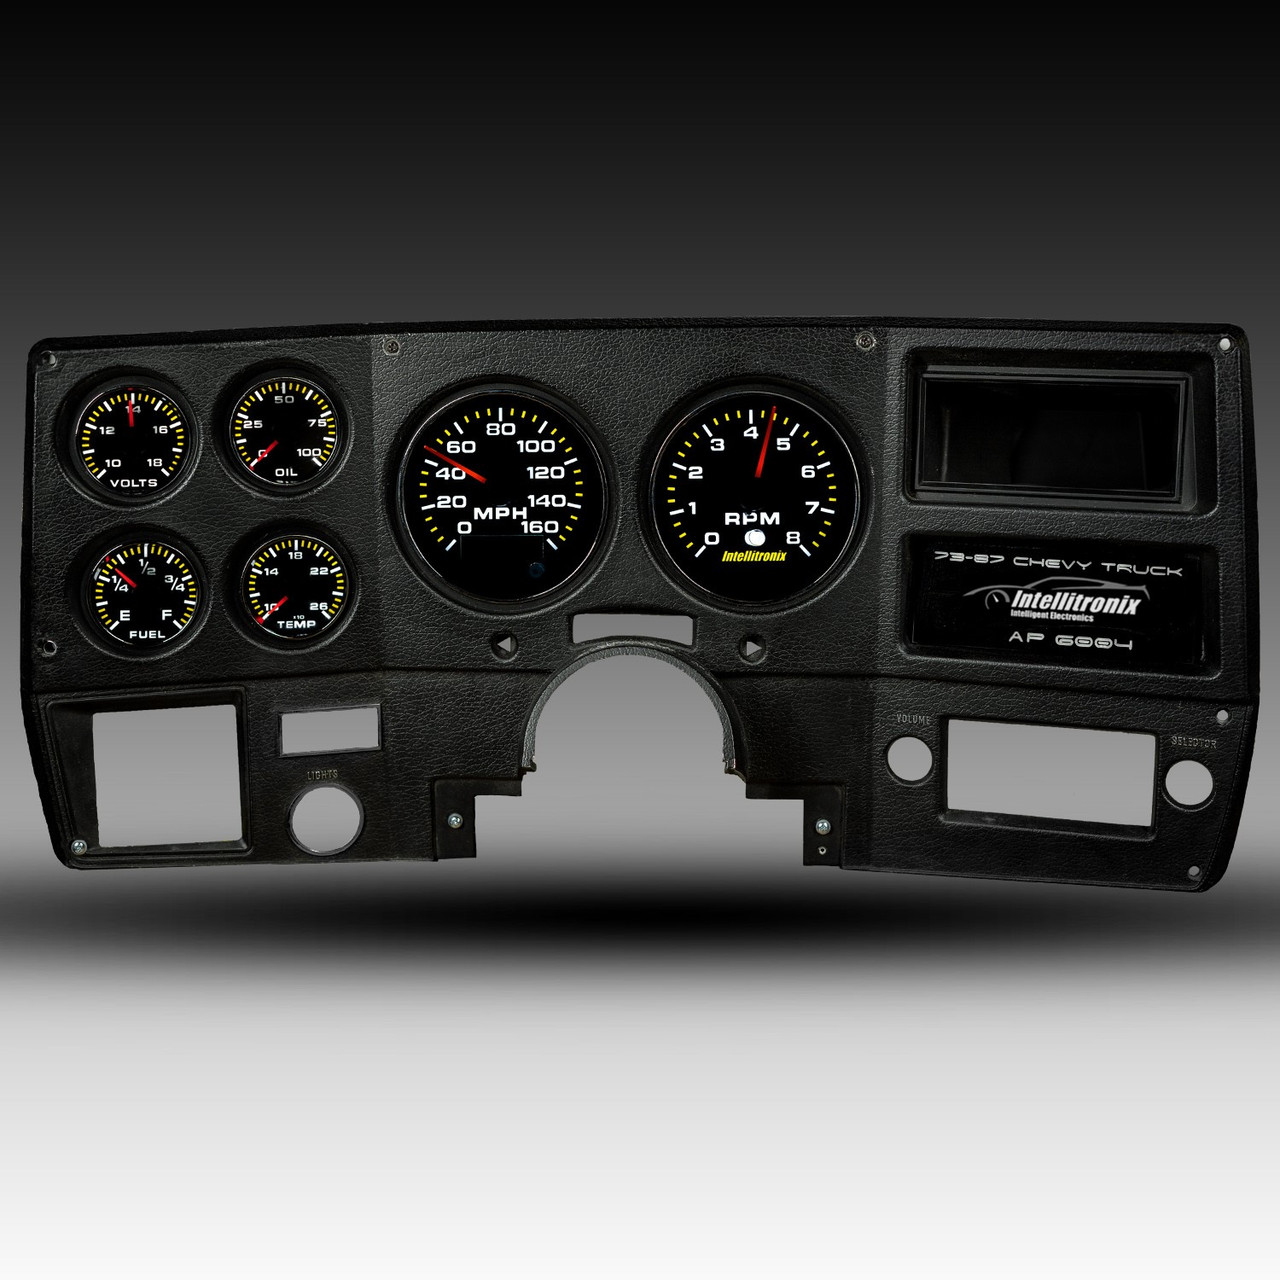 1973-1987Chevy Truck AnalogReplacement Gauge Panel - AP6004